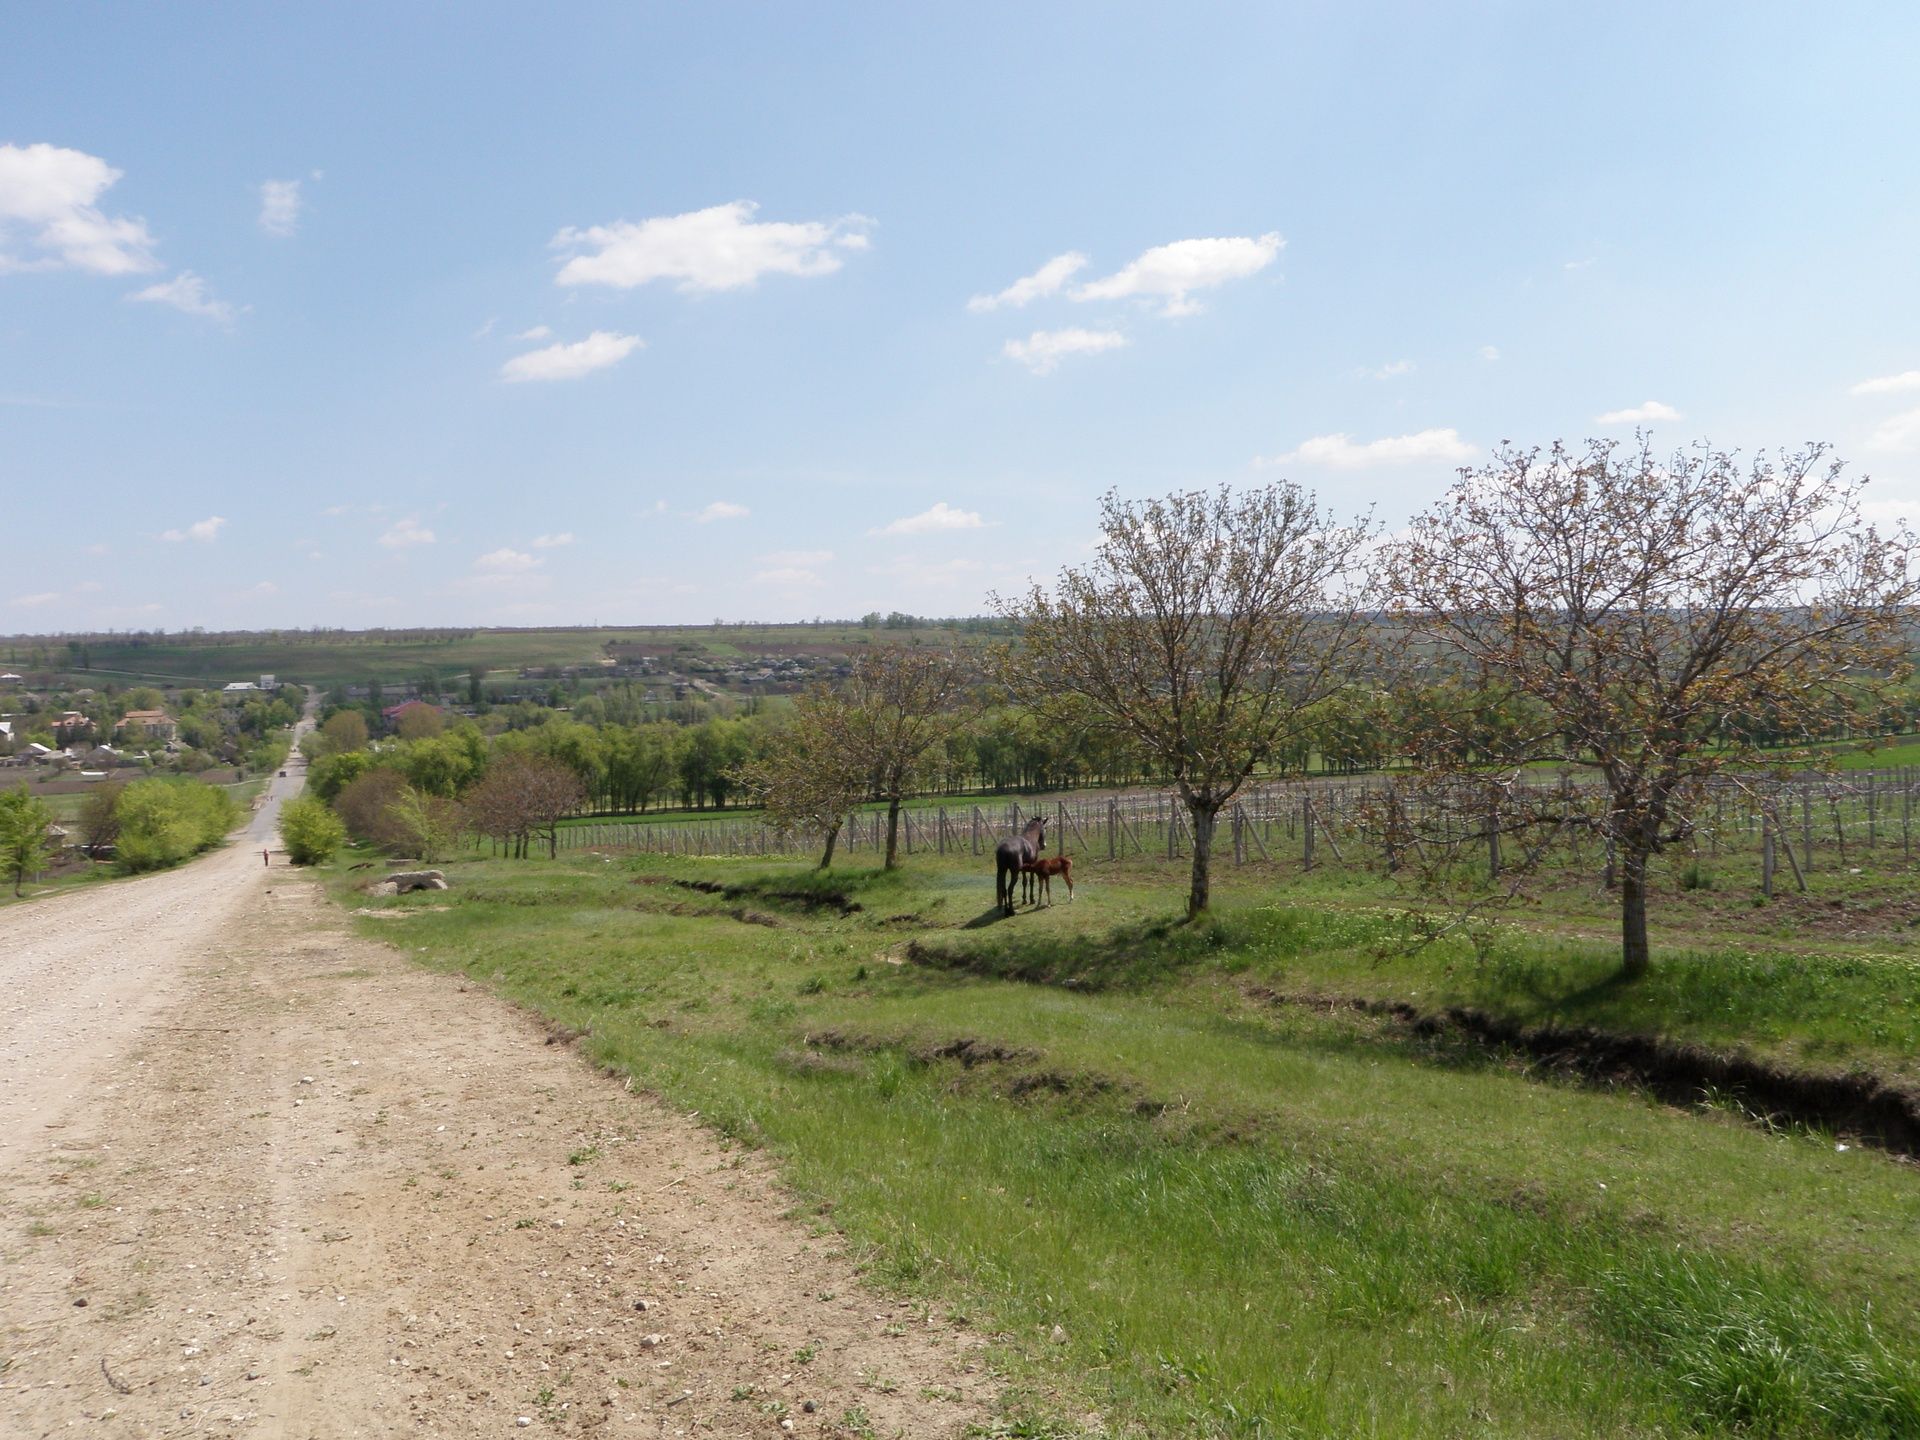 Typical Moldovan Landscape